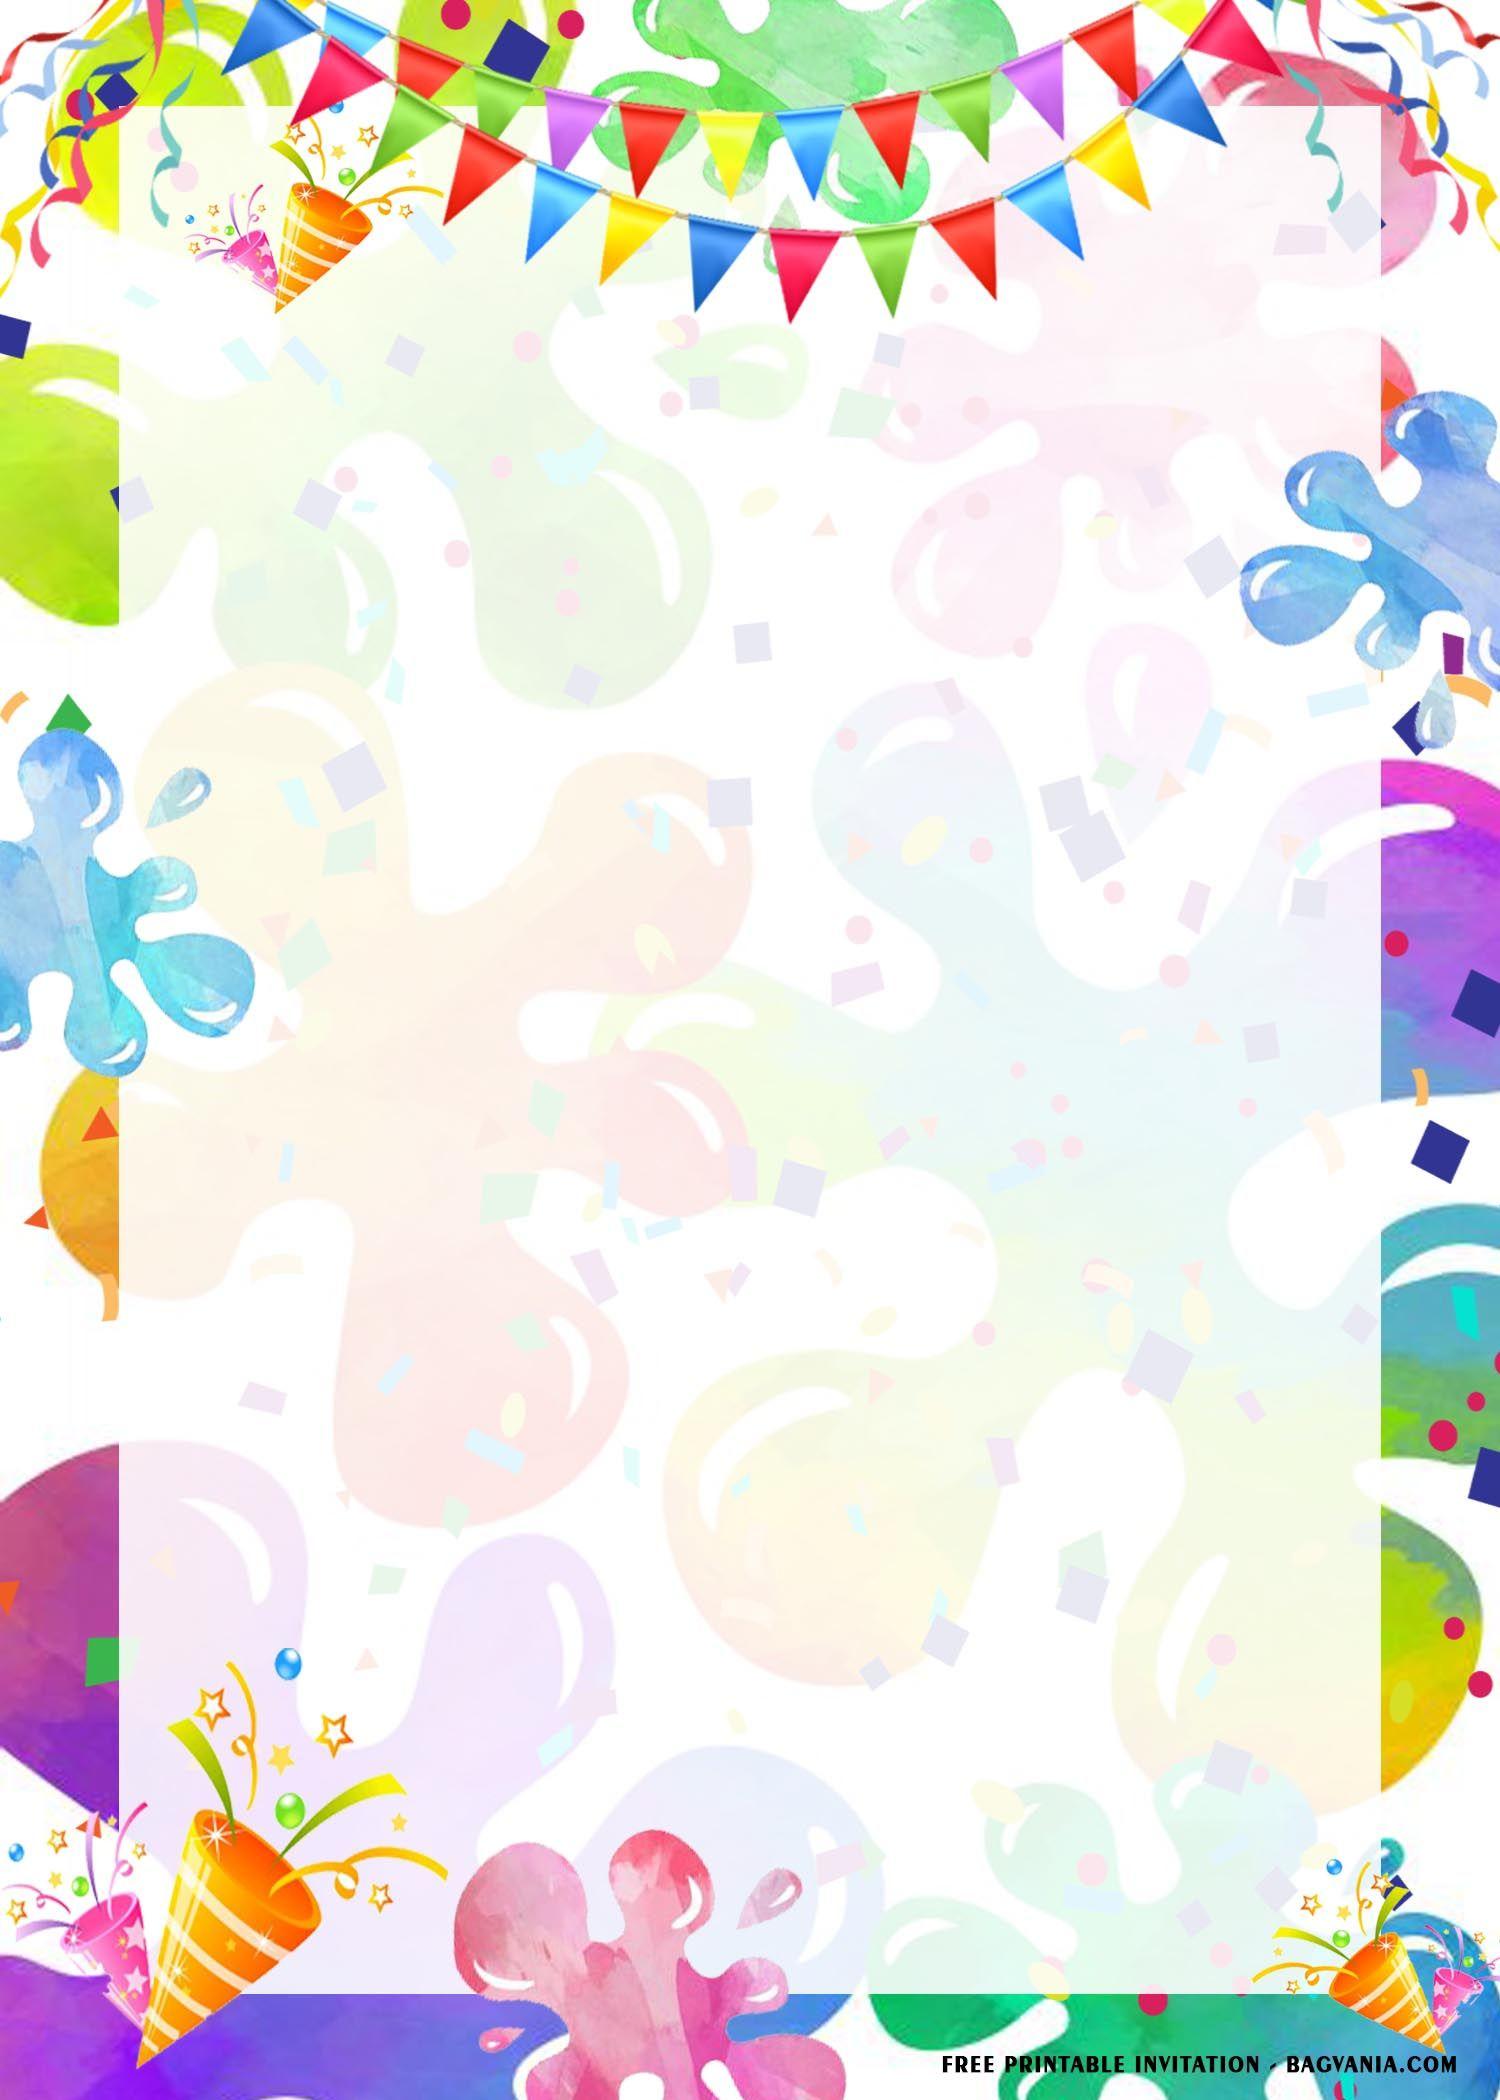 FREE Printable) - Slime Birthday Party Invitation Templates